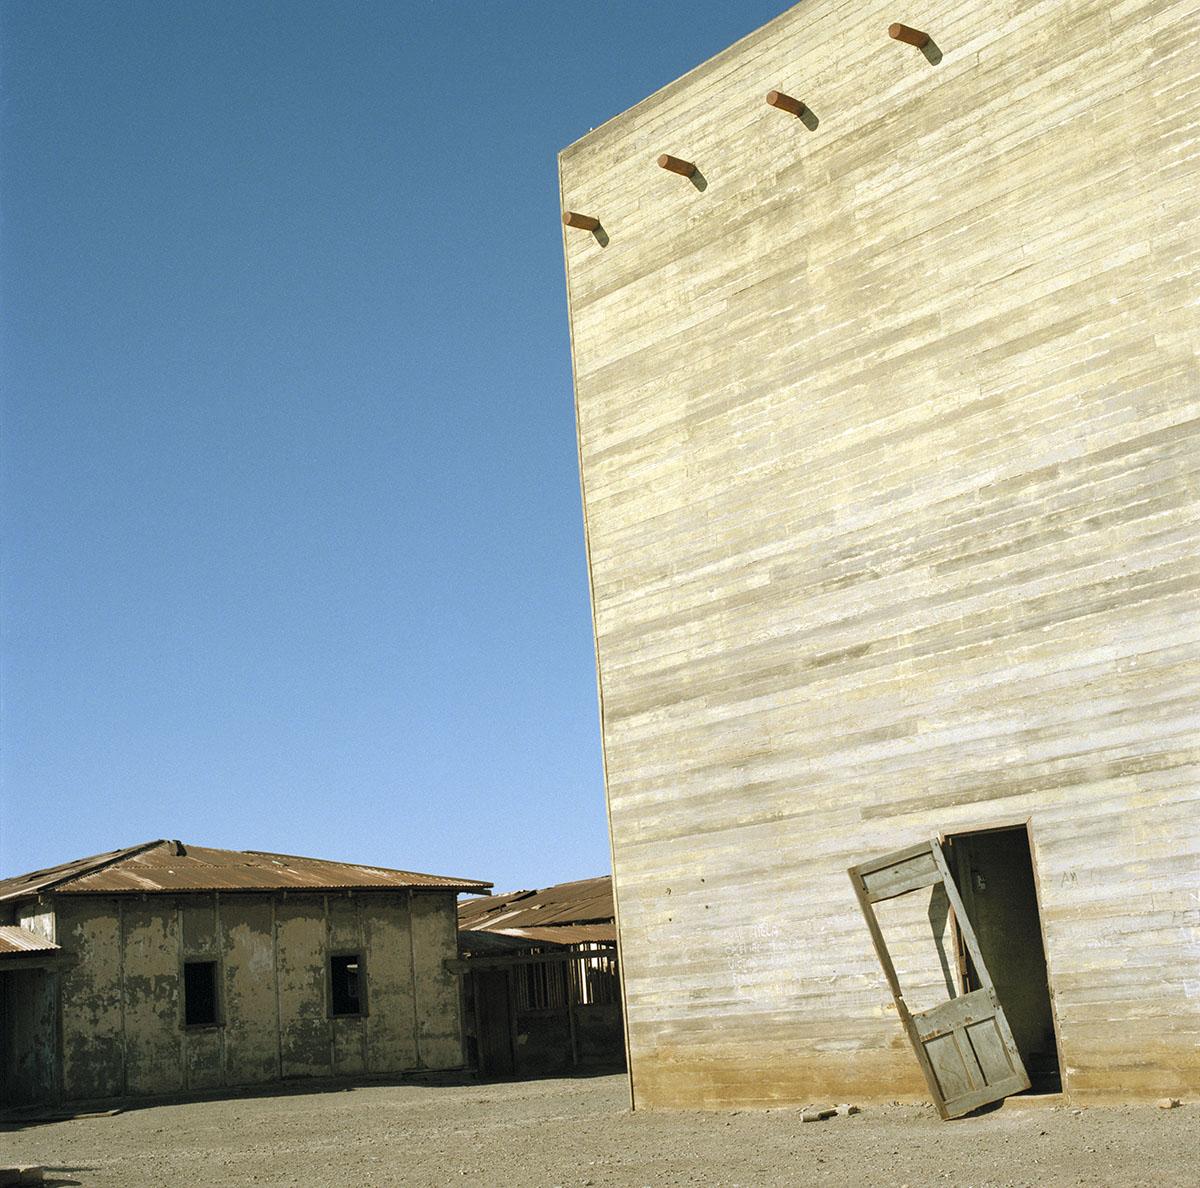 unhinged, Humberstone, Chile